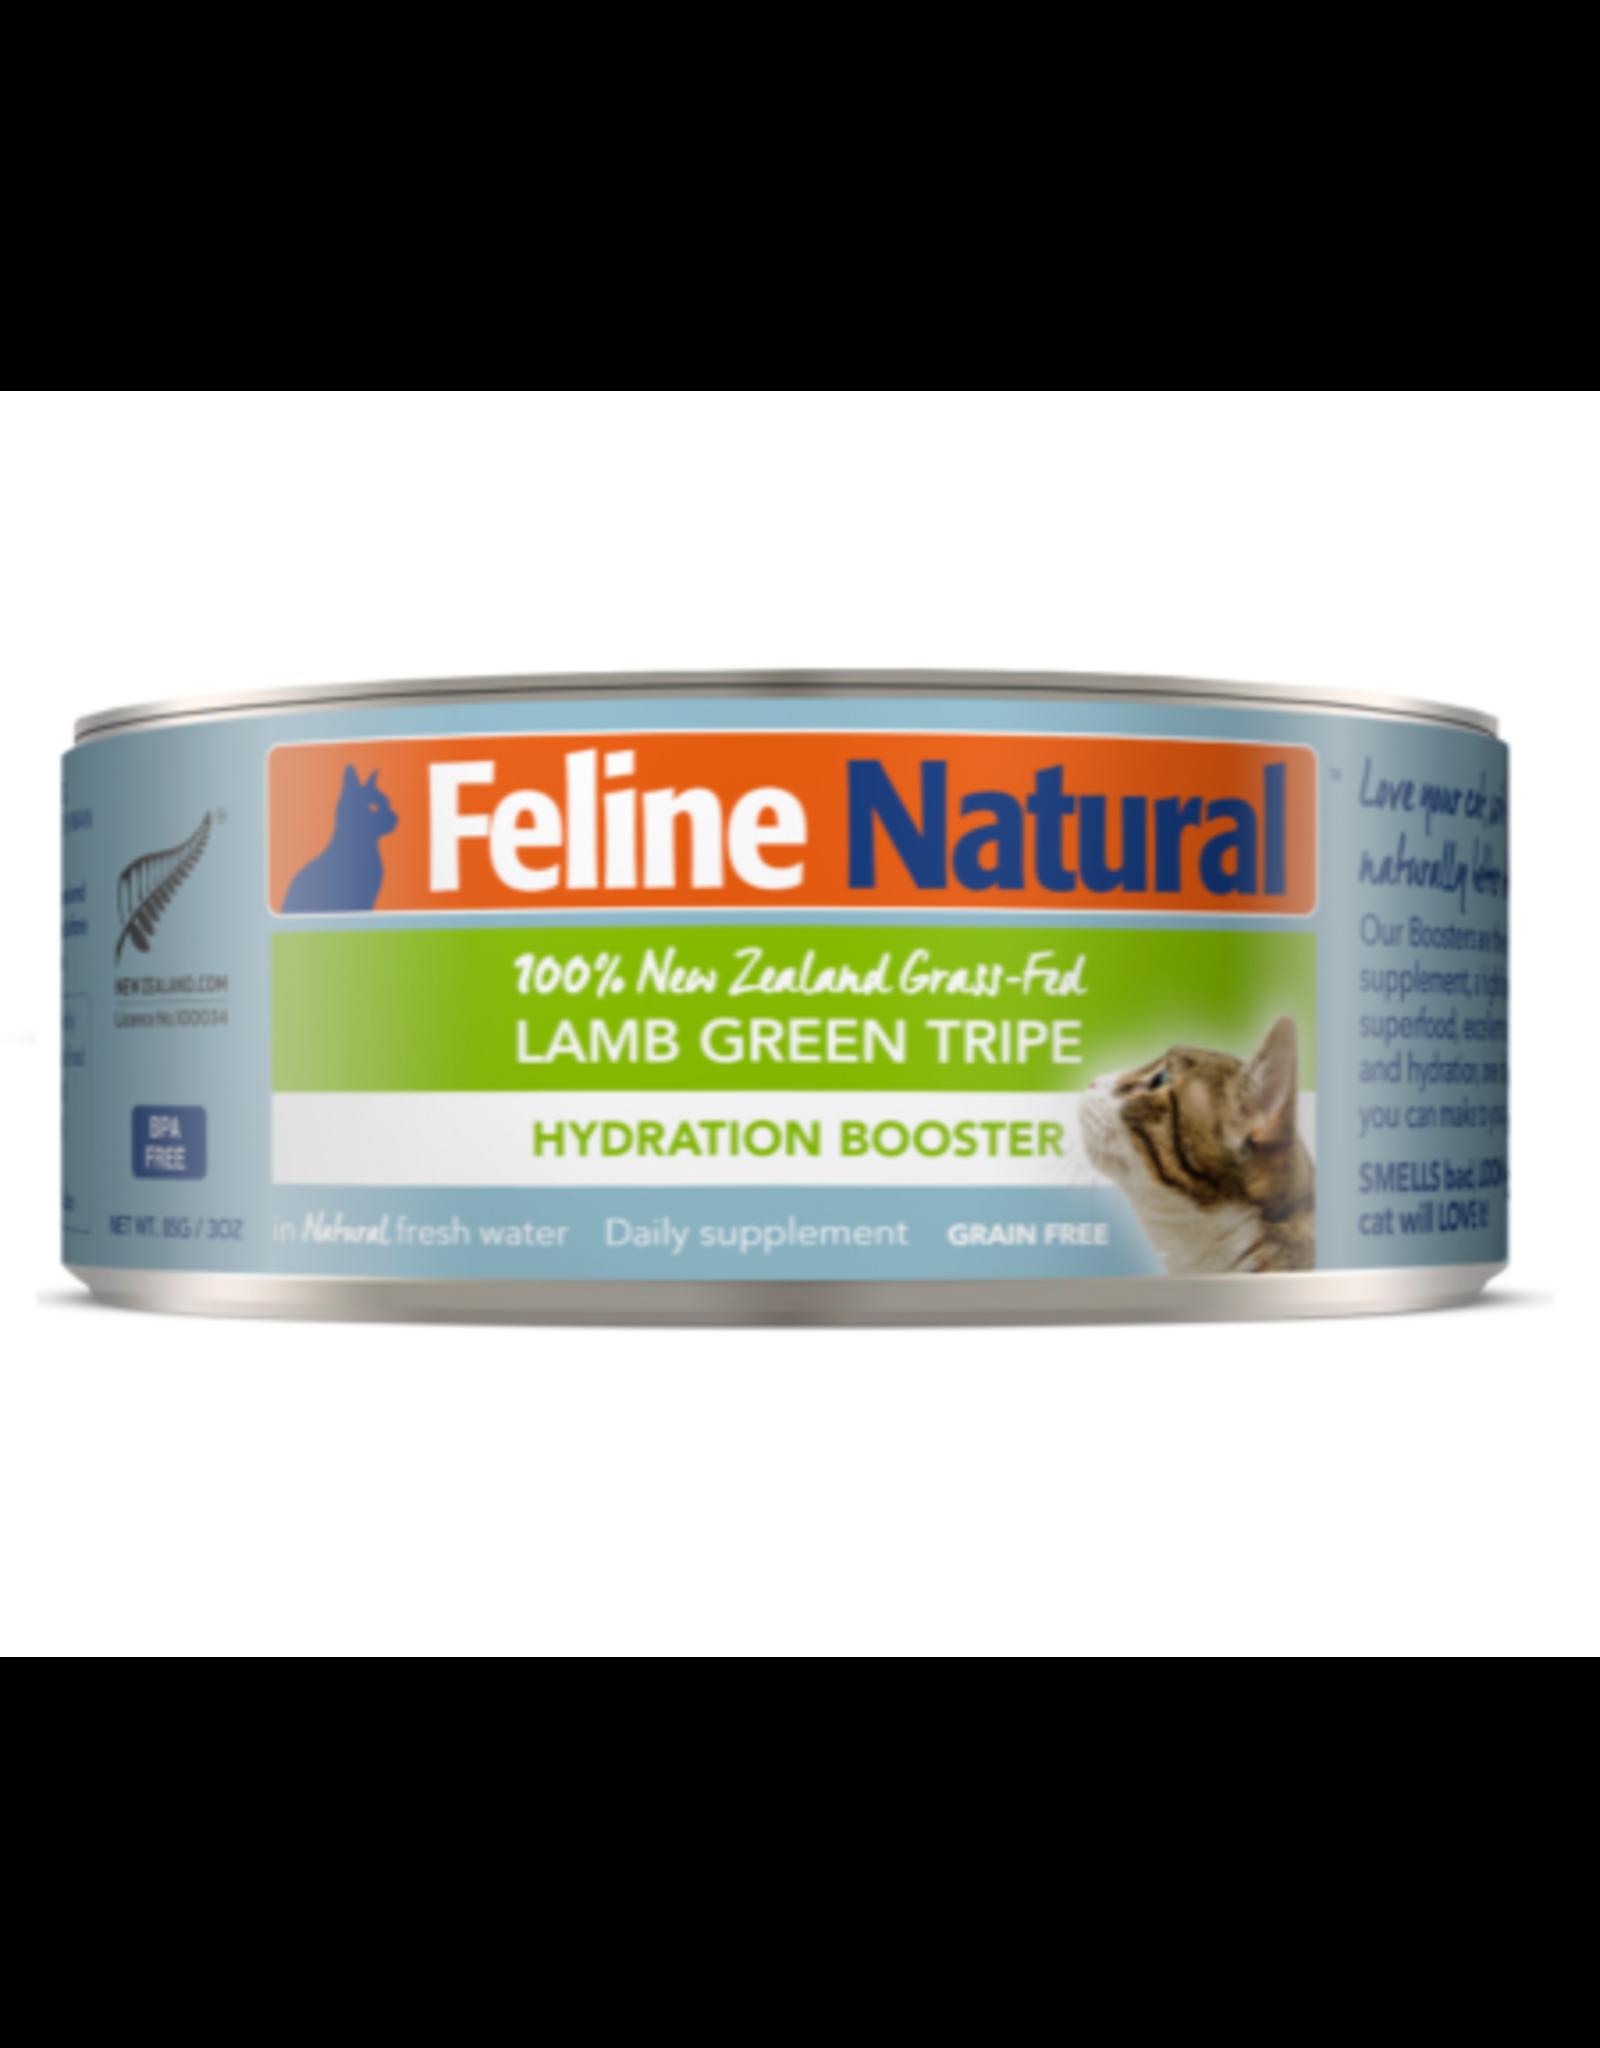 K9 Natural Feline Natural Lamb Green Tripe Hydration Booster 3oz